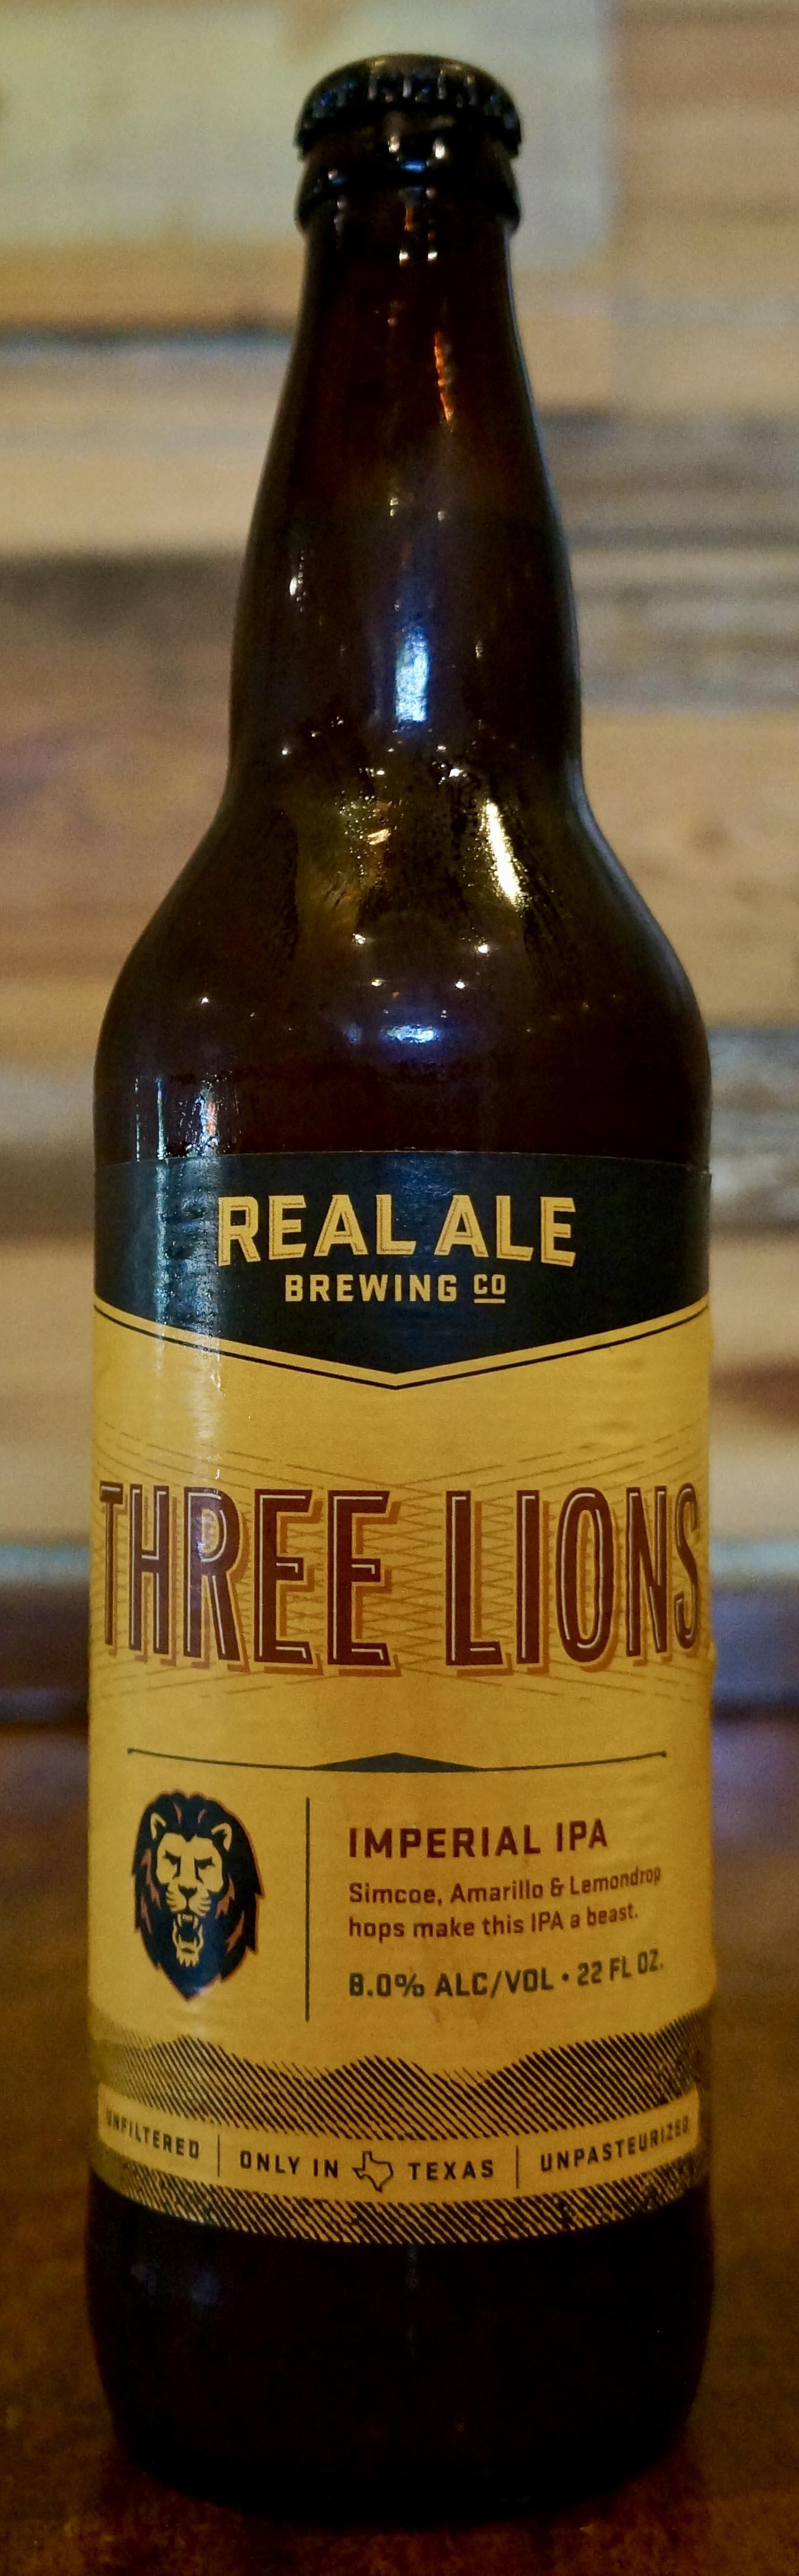 RA_3 Lions.jpg